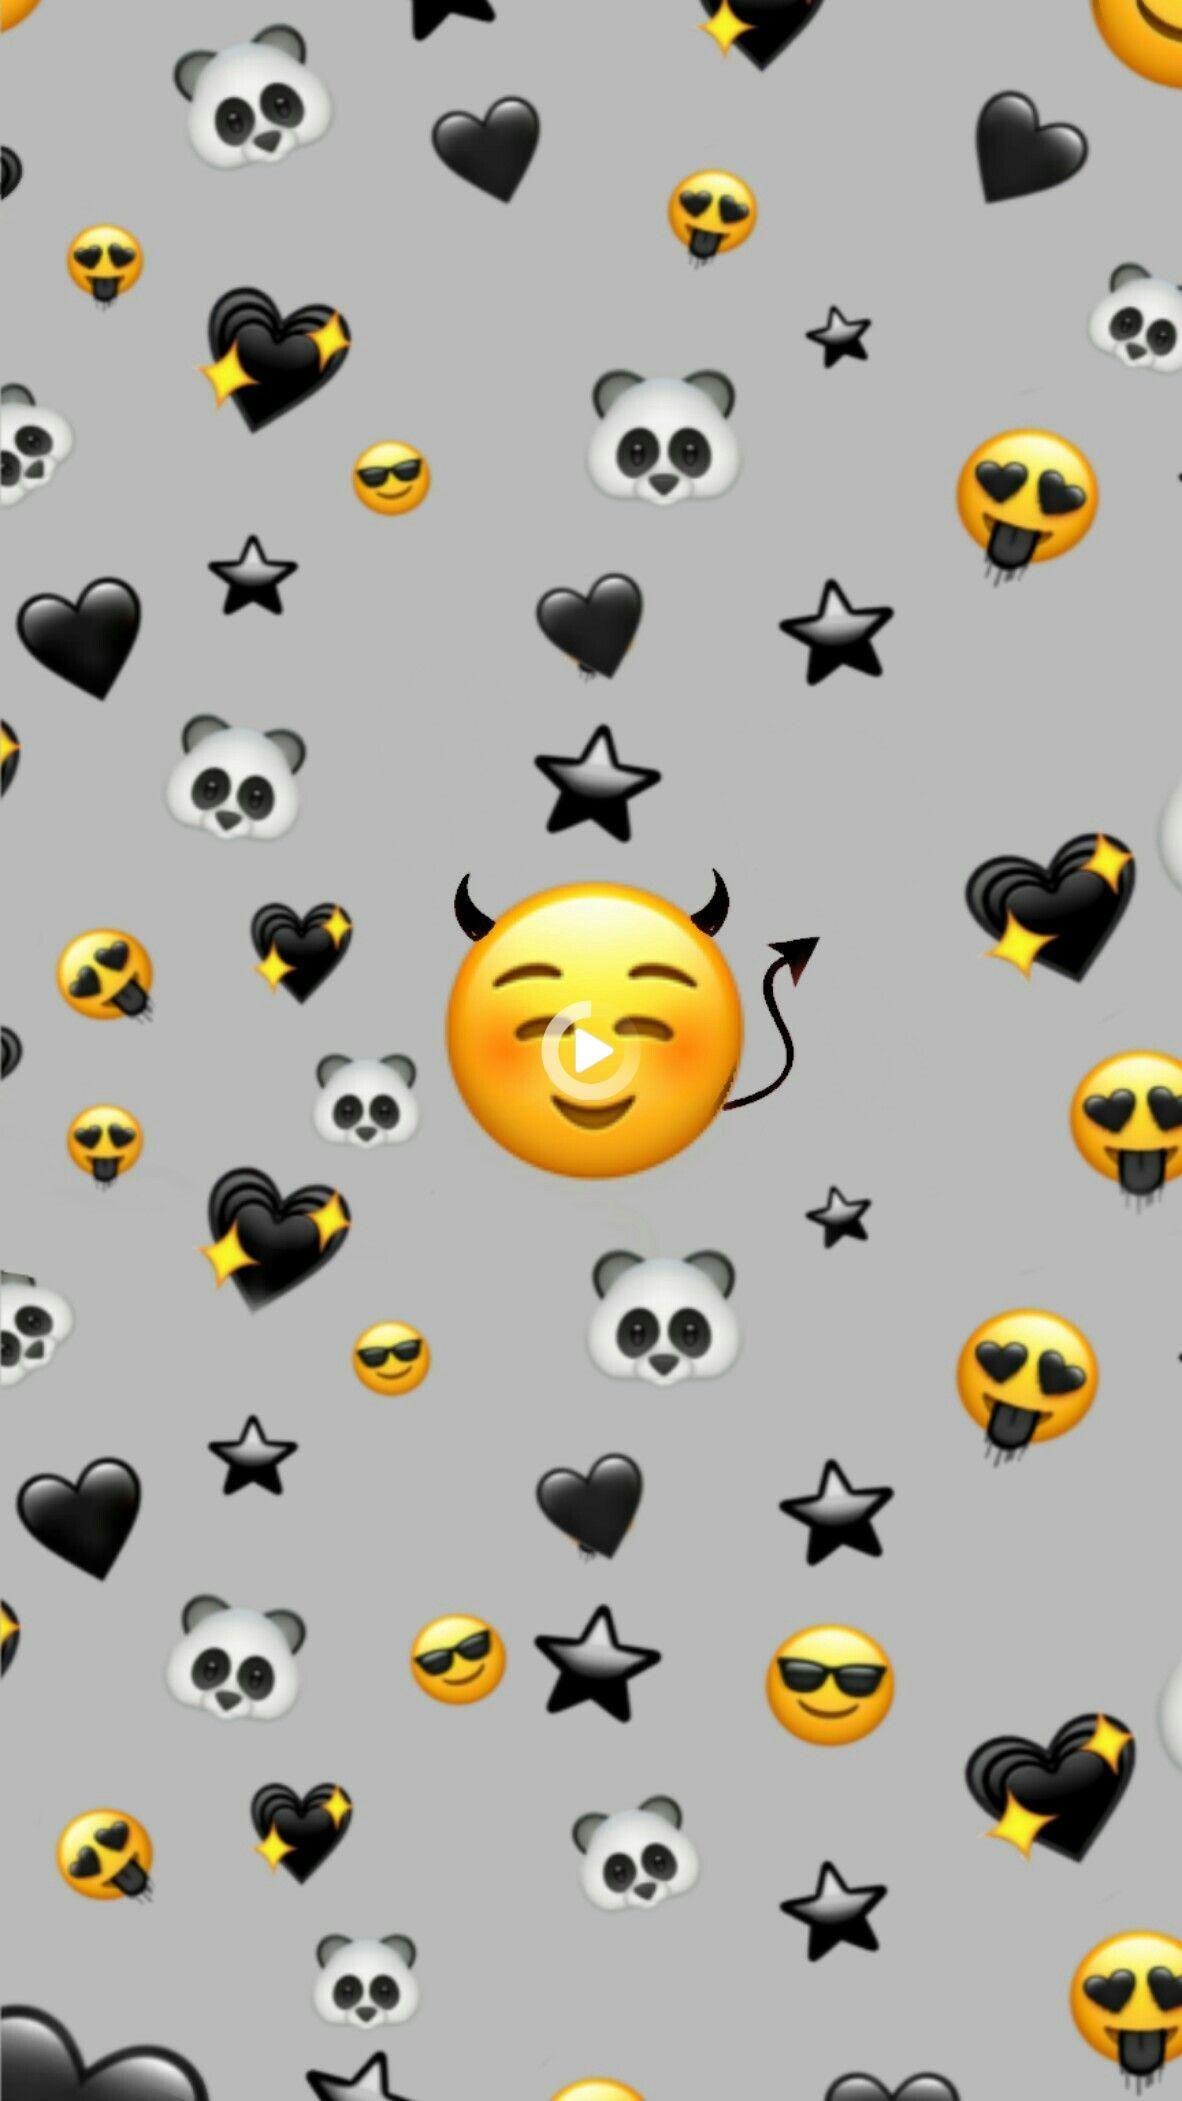 Street Rod Business Cards Zazzle Com In 2021 Cute Emoji Wallpaper Emoji Wallpaper Emoji Wallpaper Iphone